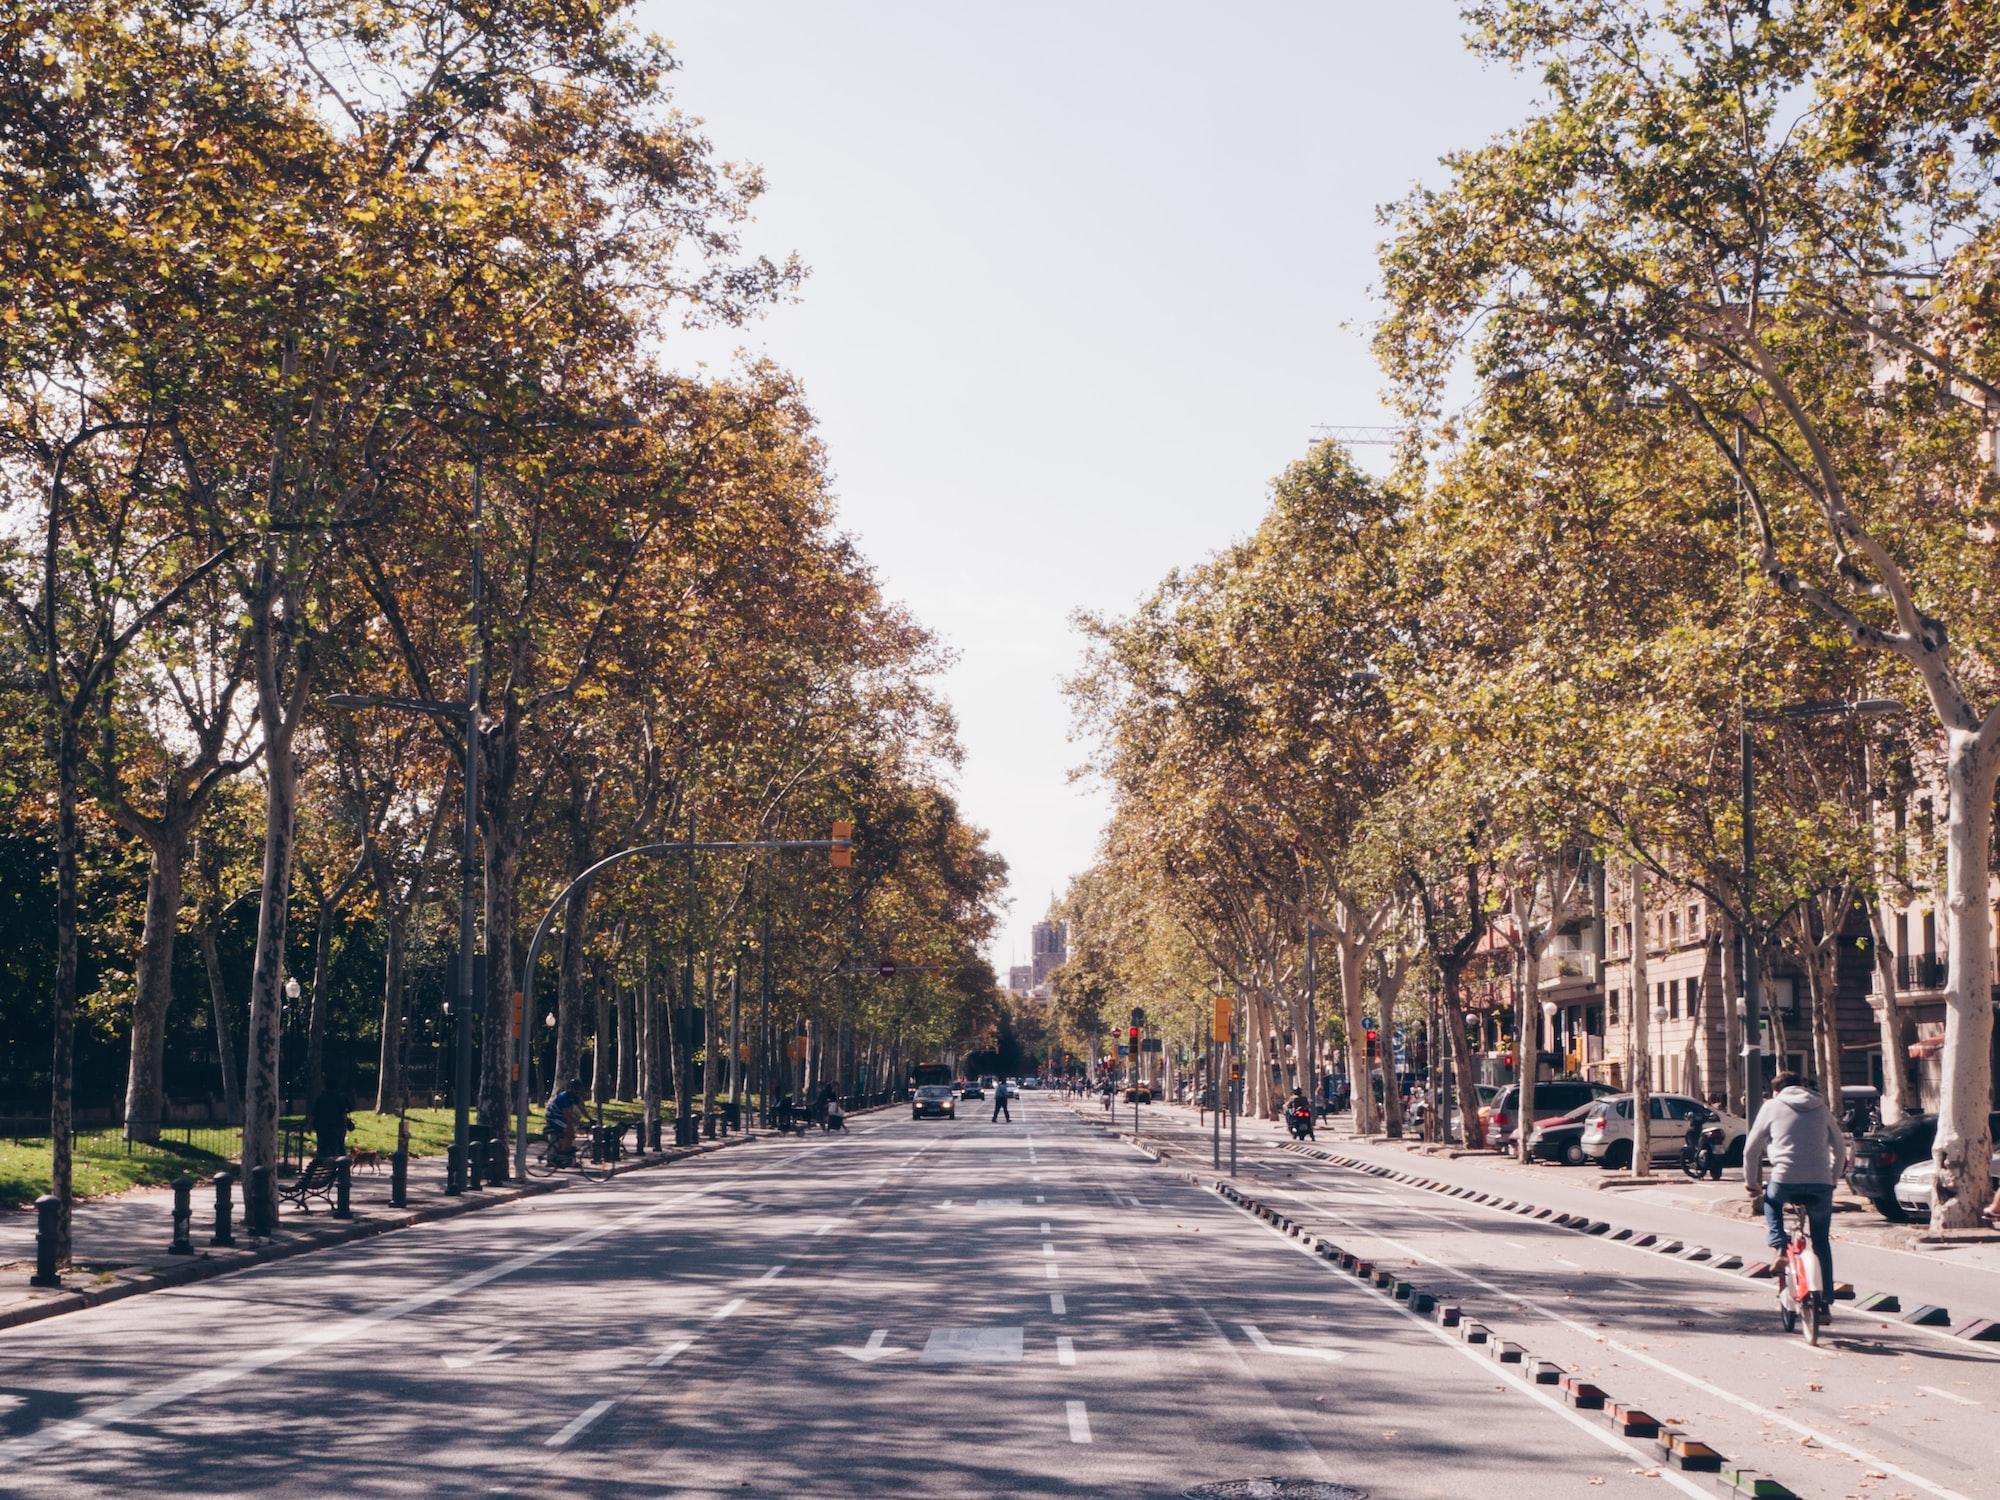 Sunny Barcelona street during autumn